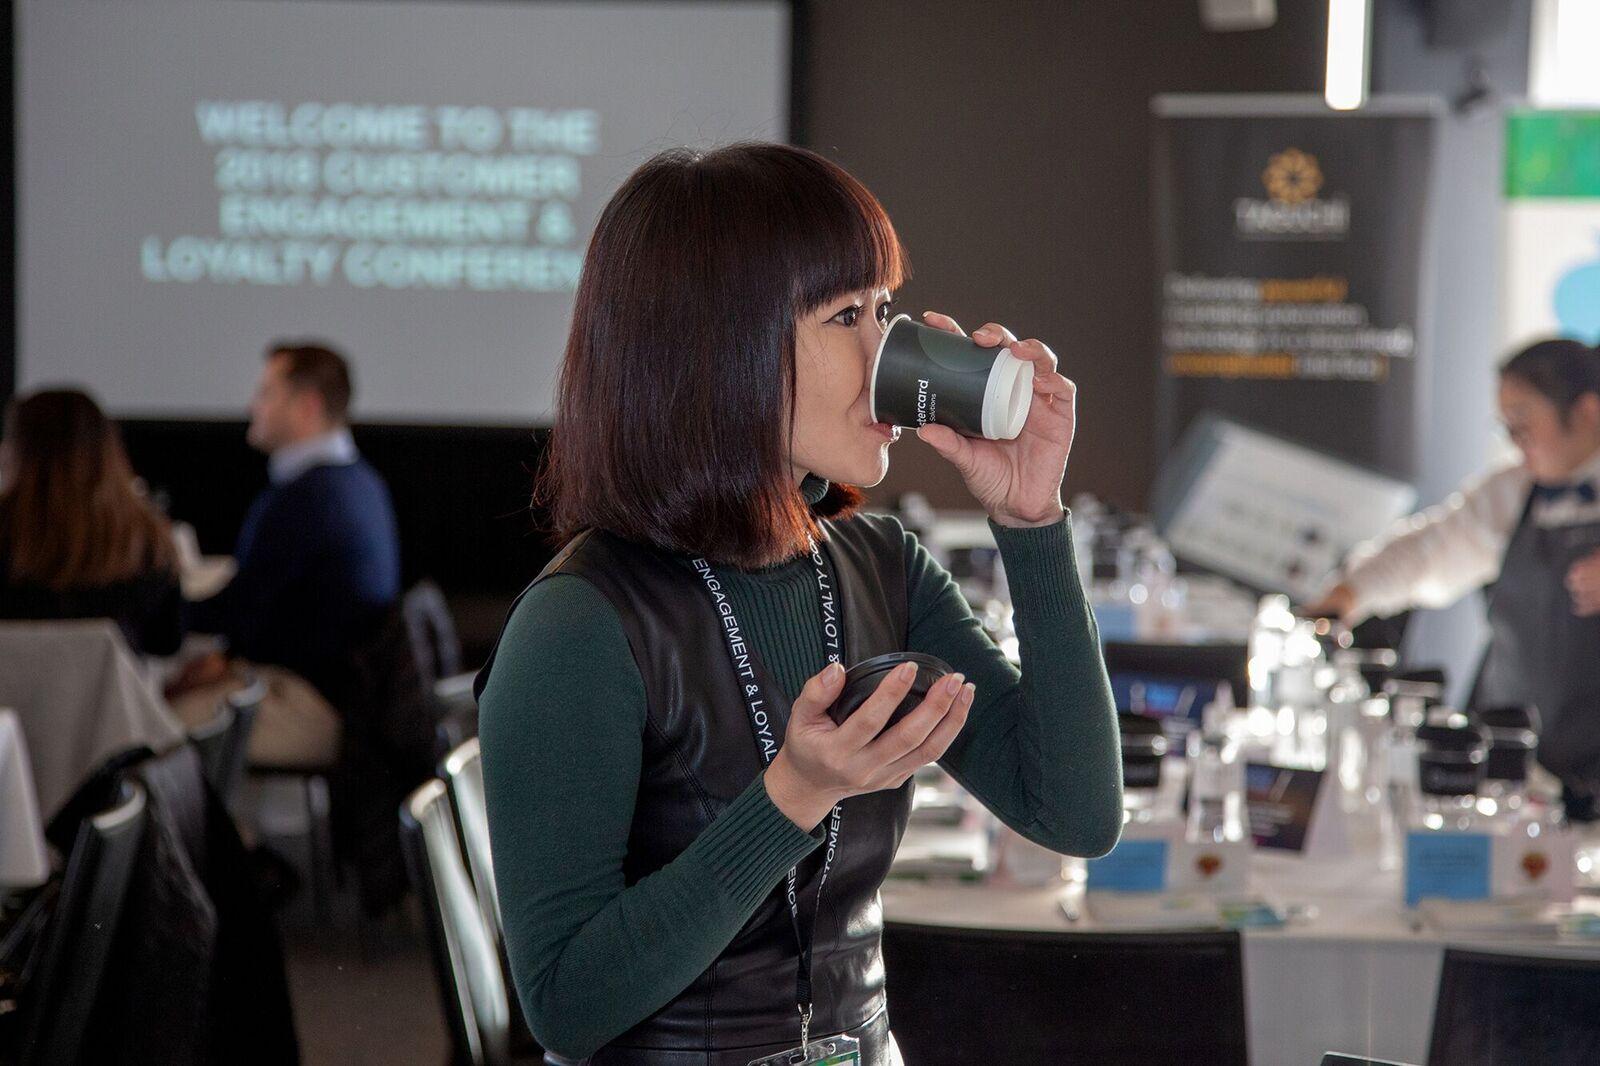 Woman_Drinking_Coffee_GL_BLOG-300x200.jpg